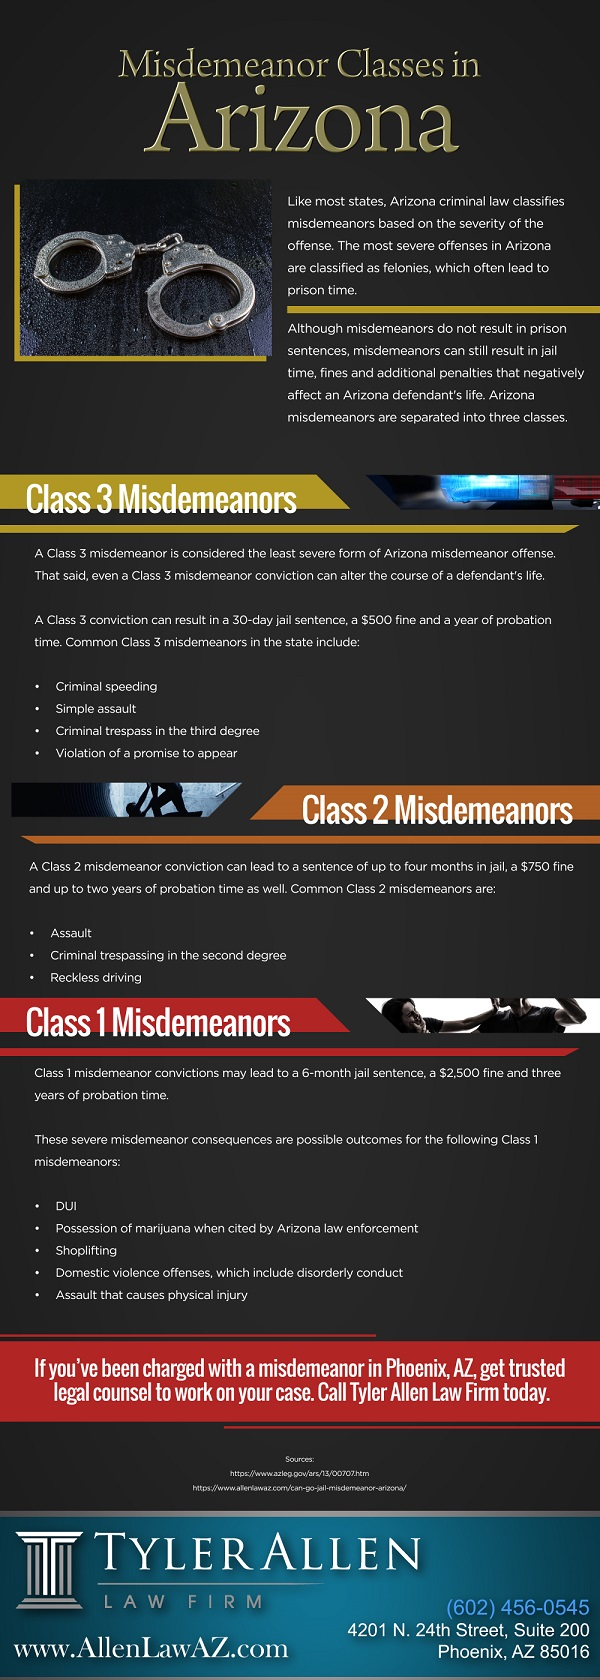 Misdemeanor Classes in Arizona